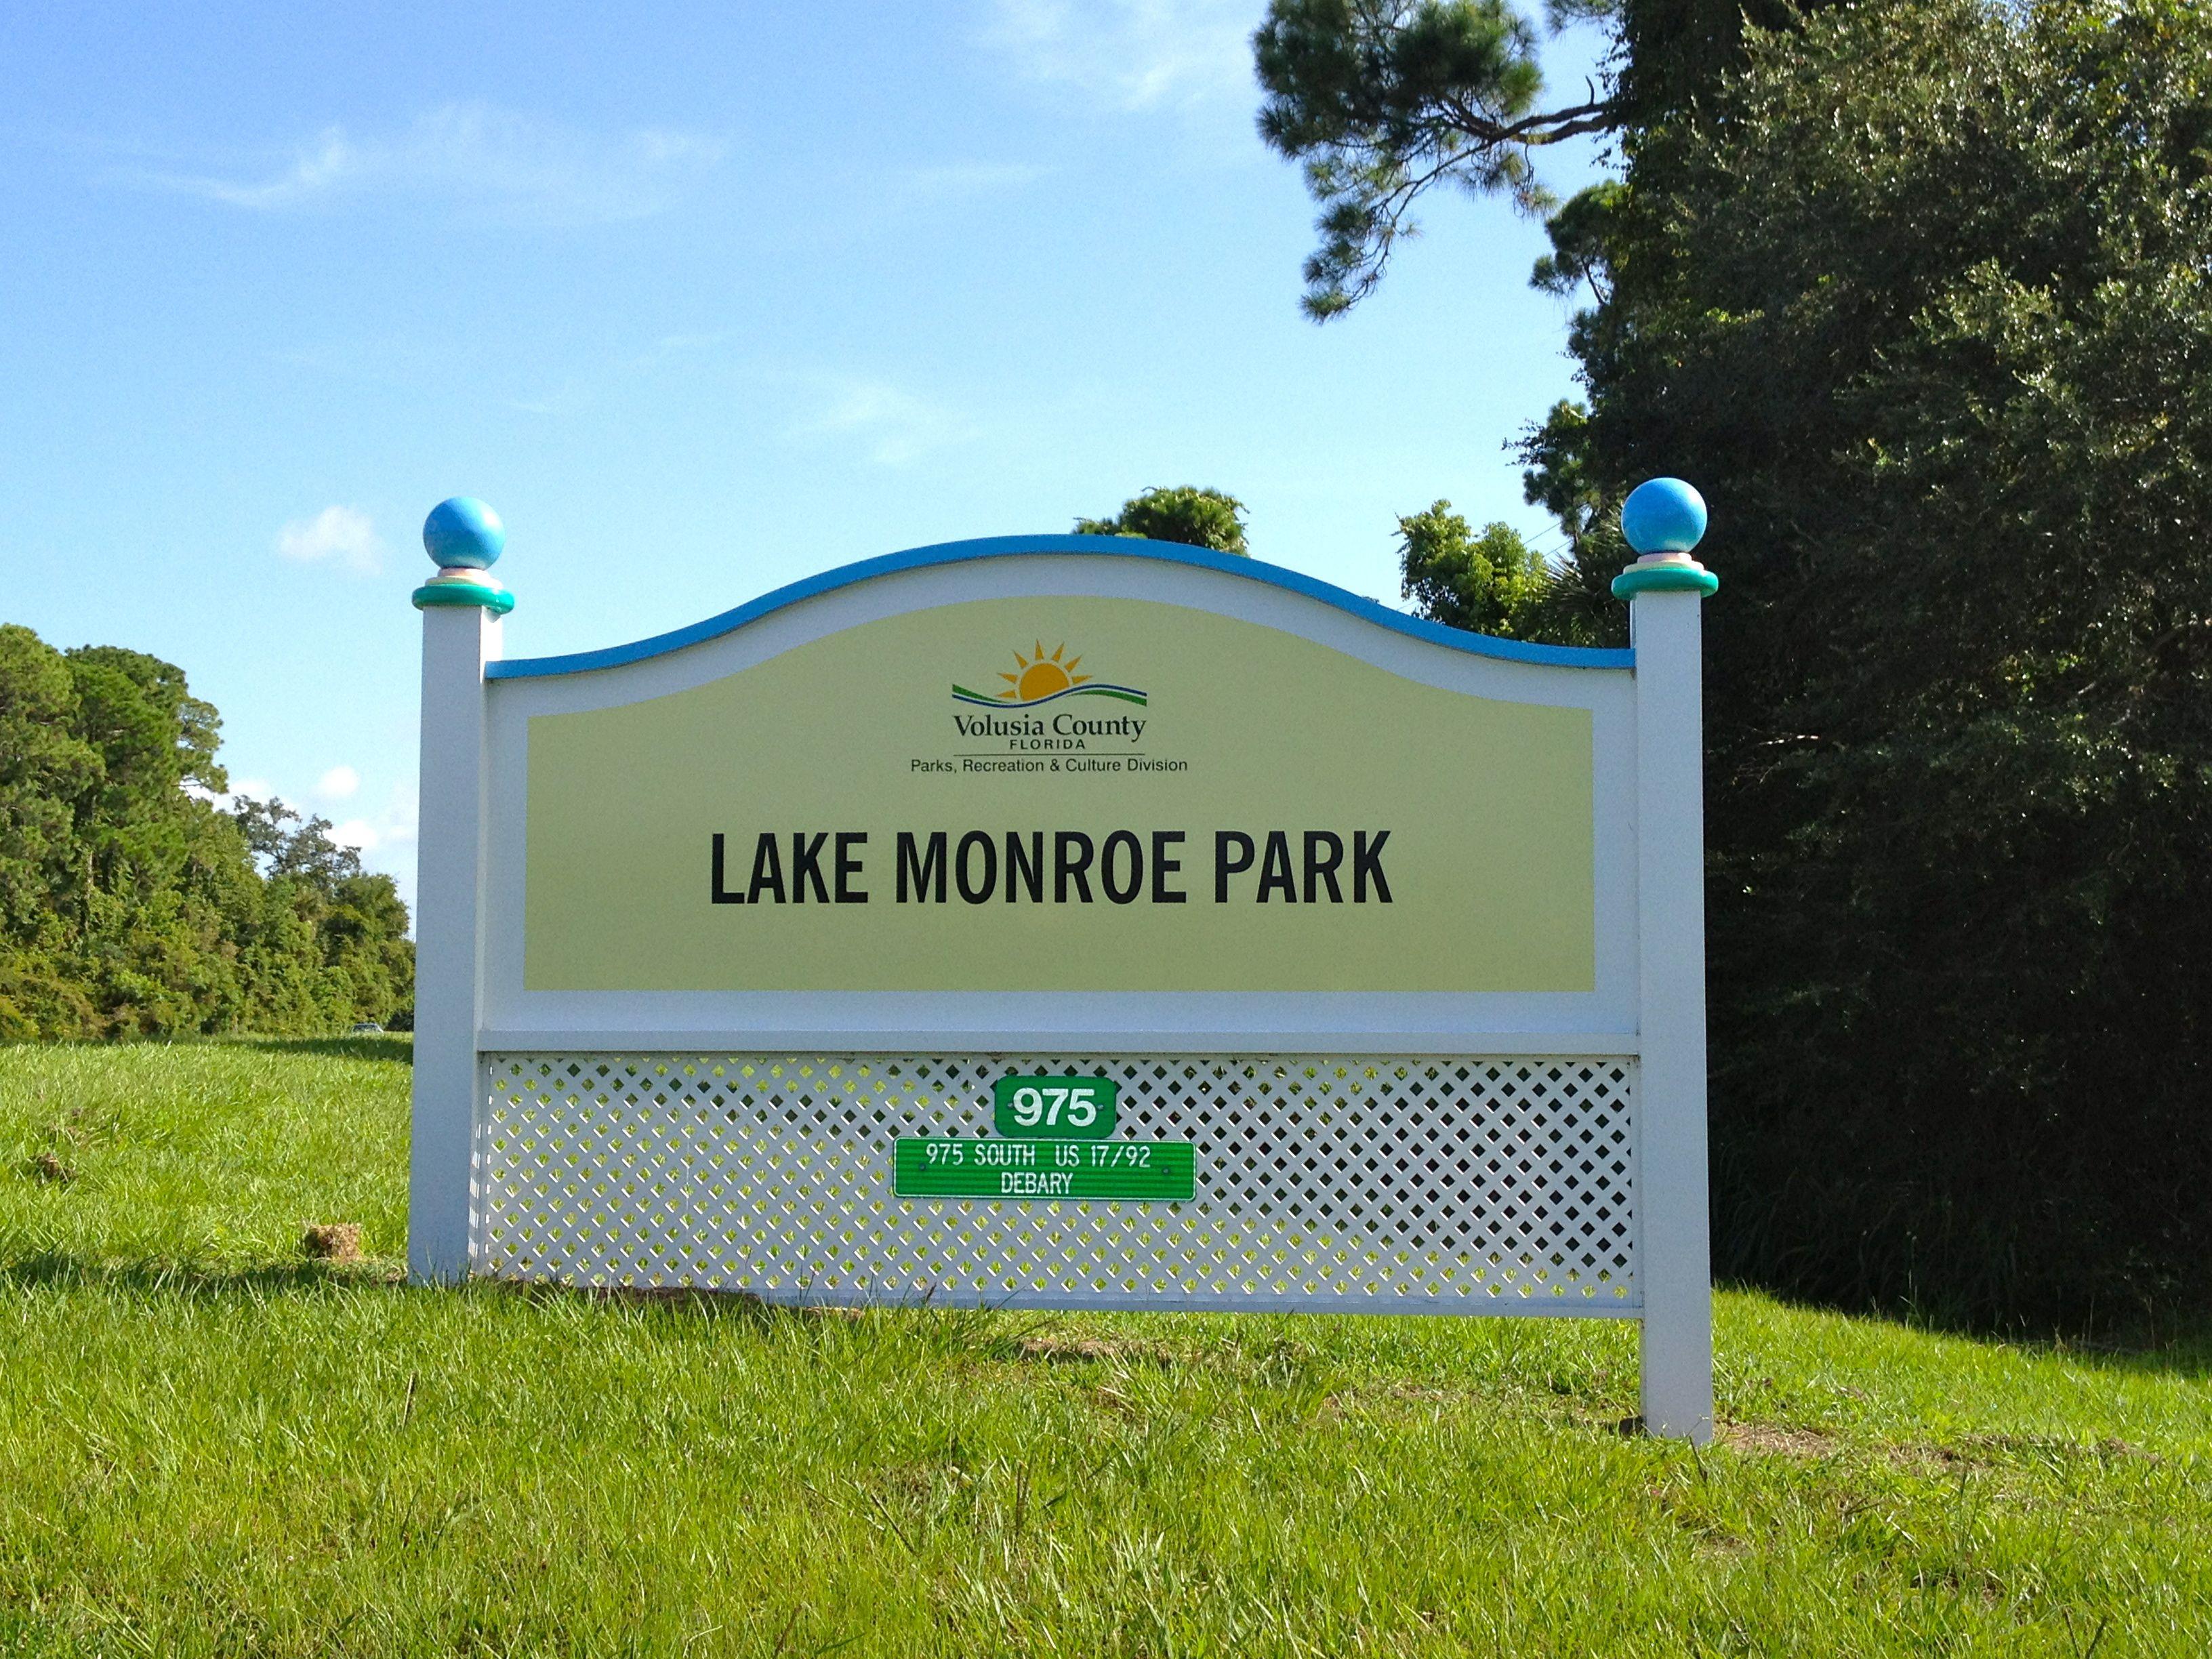 Lake monroe park near riviera bella lake park riviera